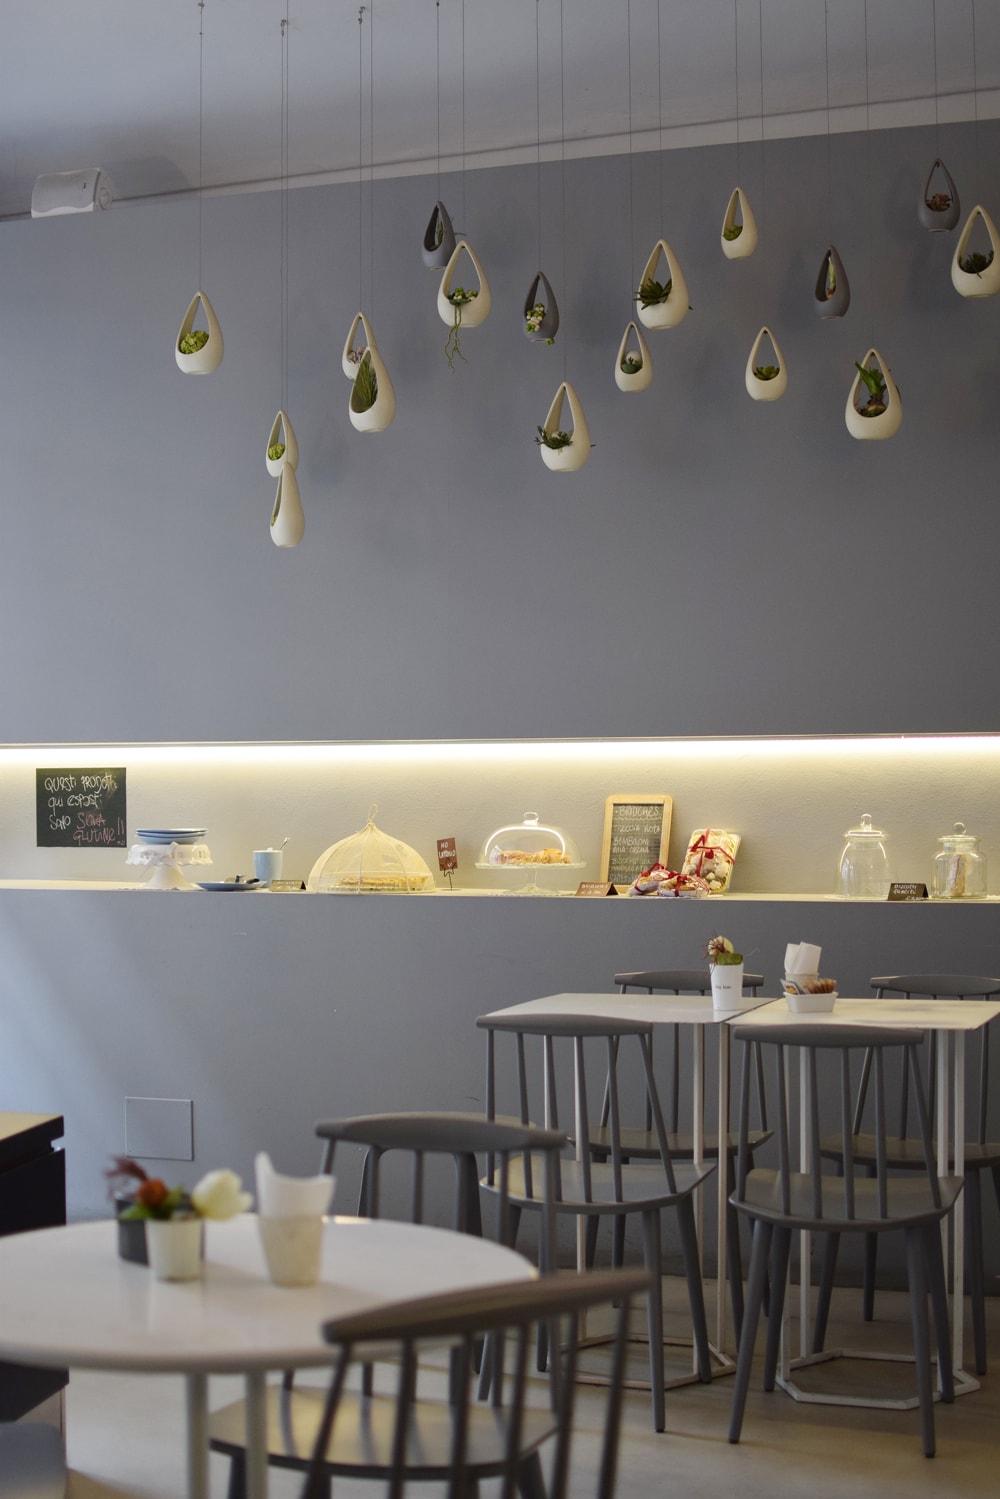 Gluti gluten free coffee shop in Turin